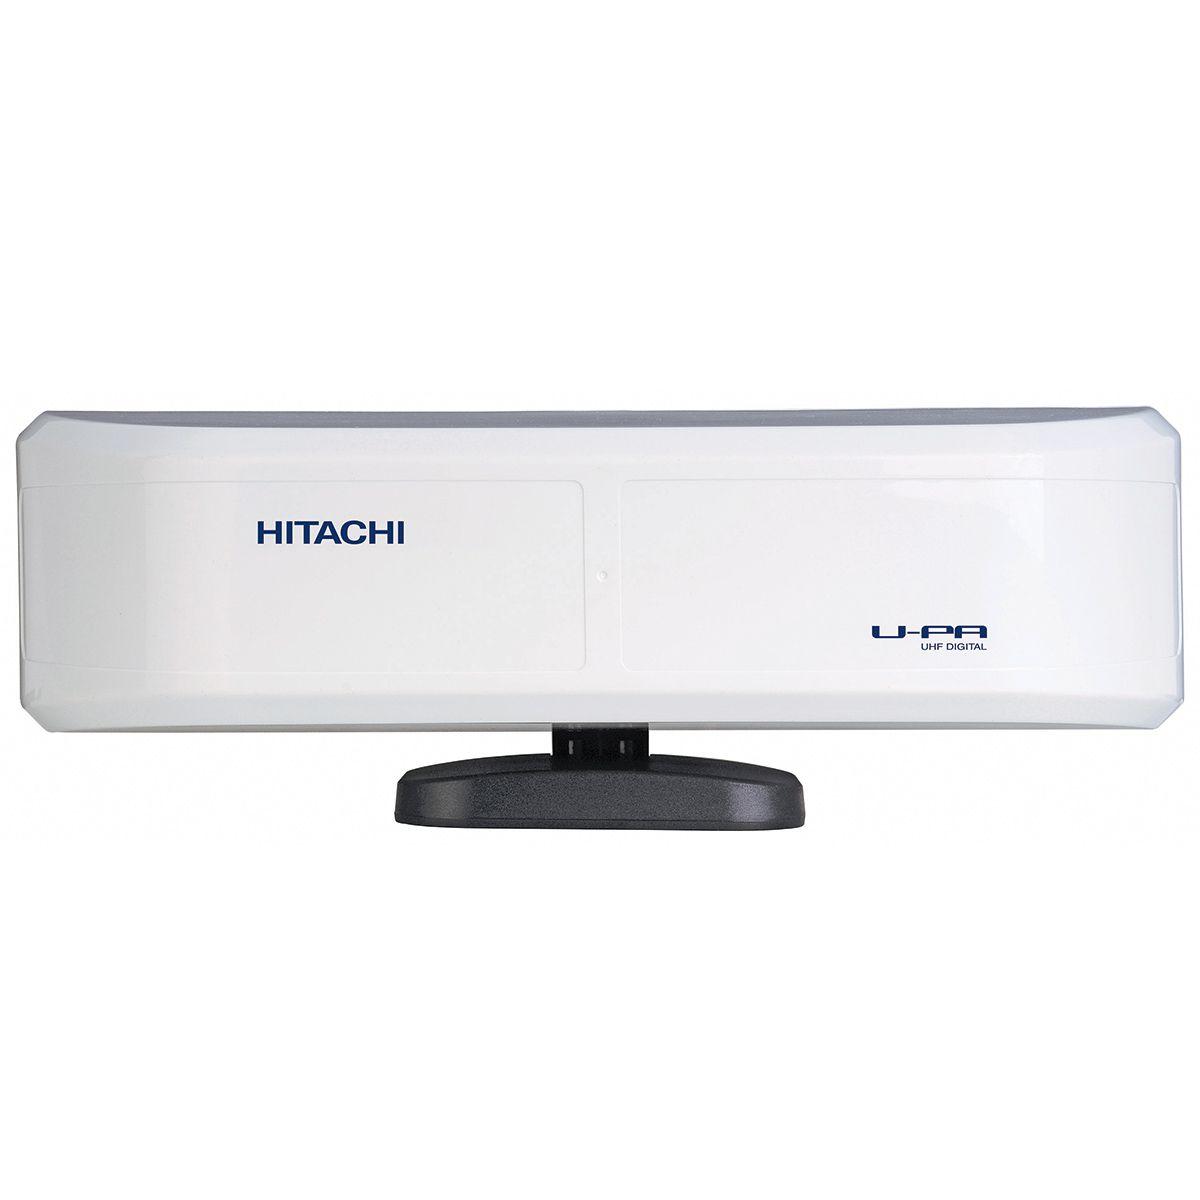 Antena Digital para TV U-Pa Modular Interna Branco - Hitachi